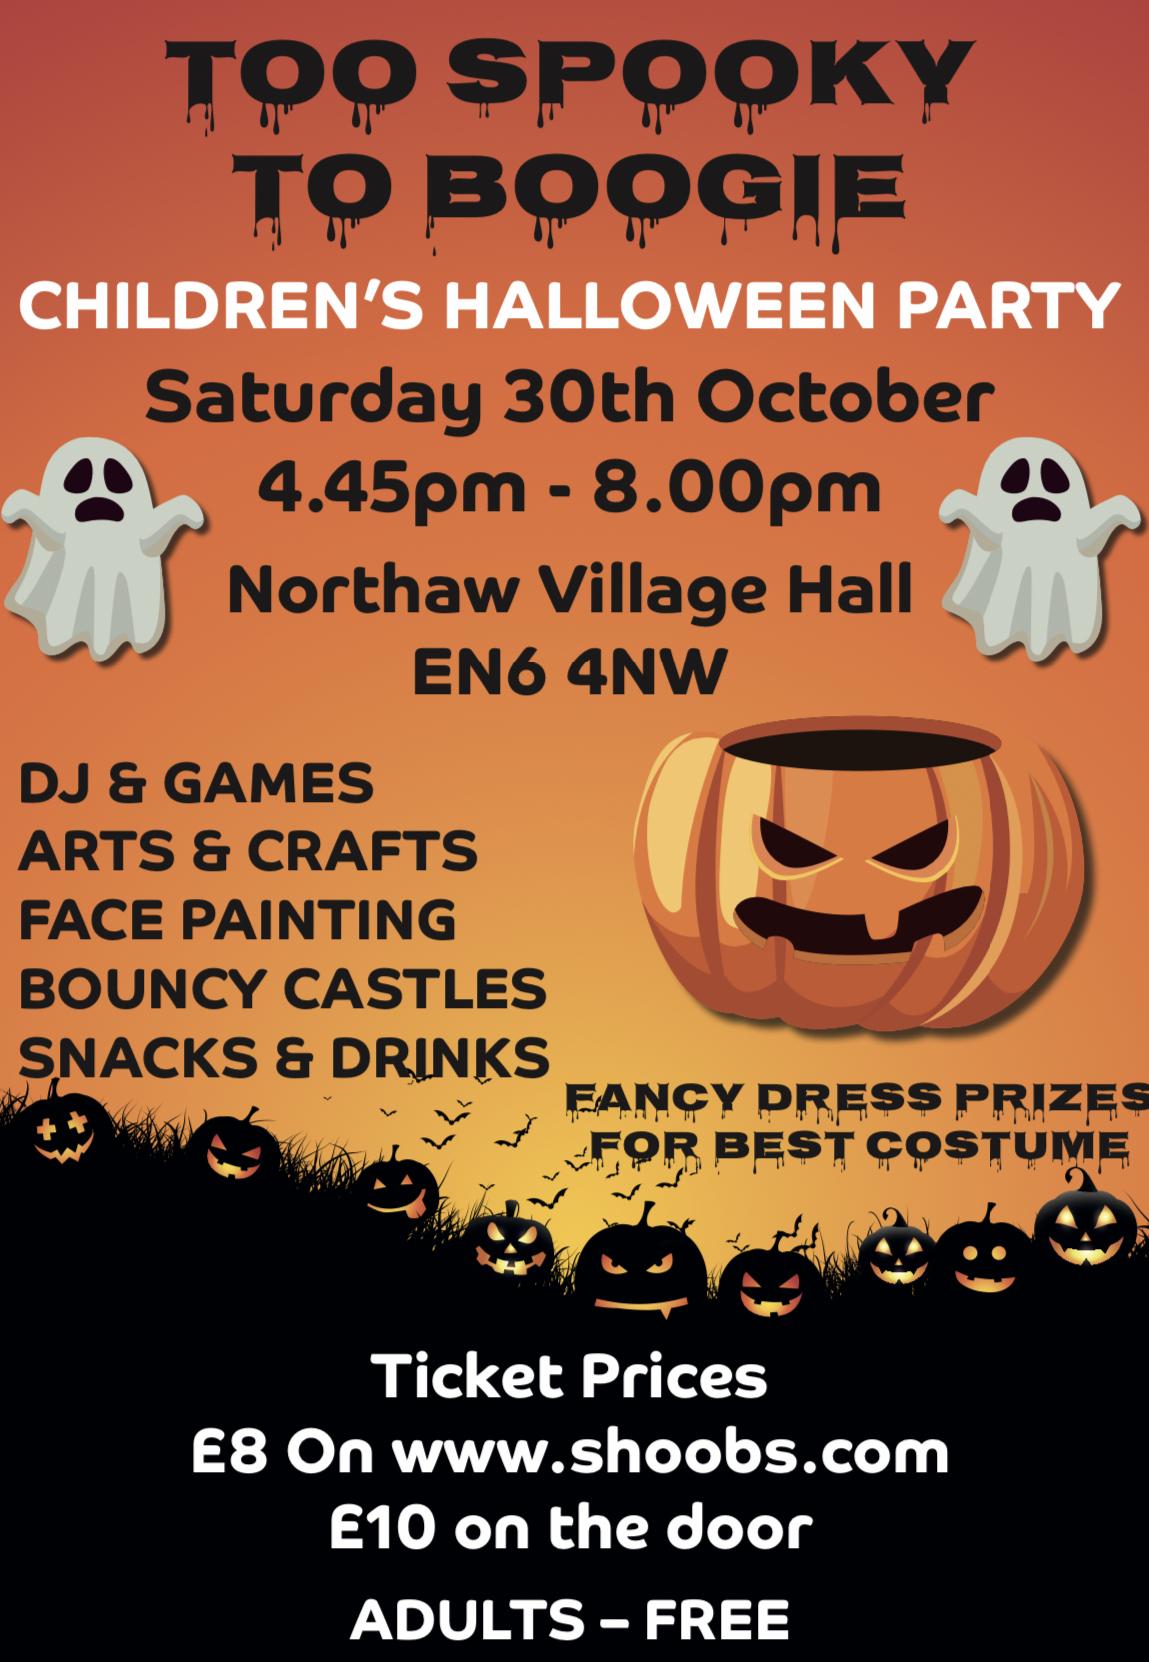 Too spooky to boogie- Children's Halloween party